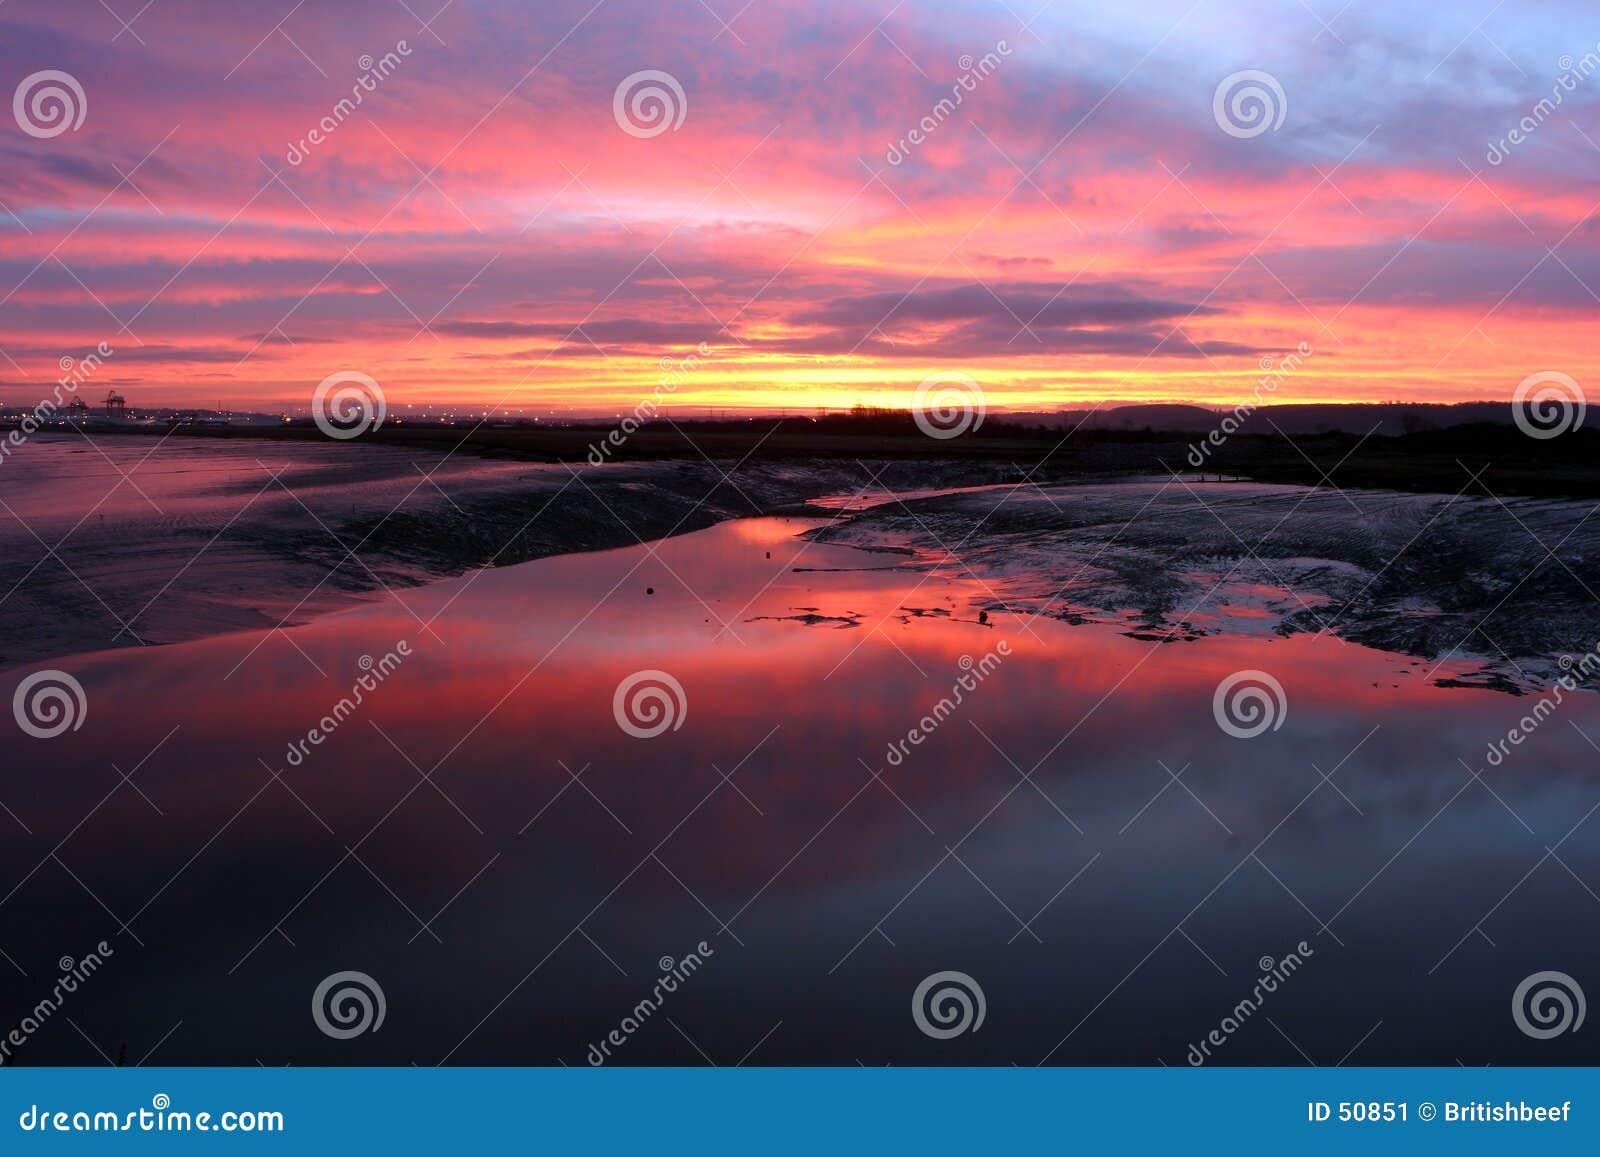 Sunrise over estuary 2